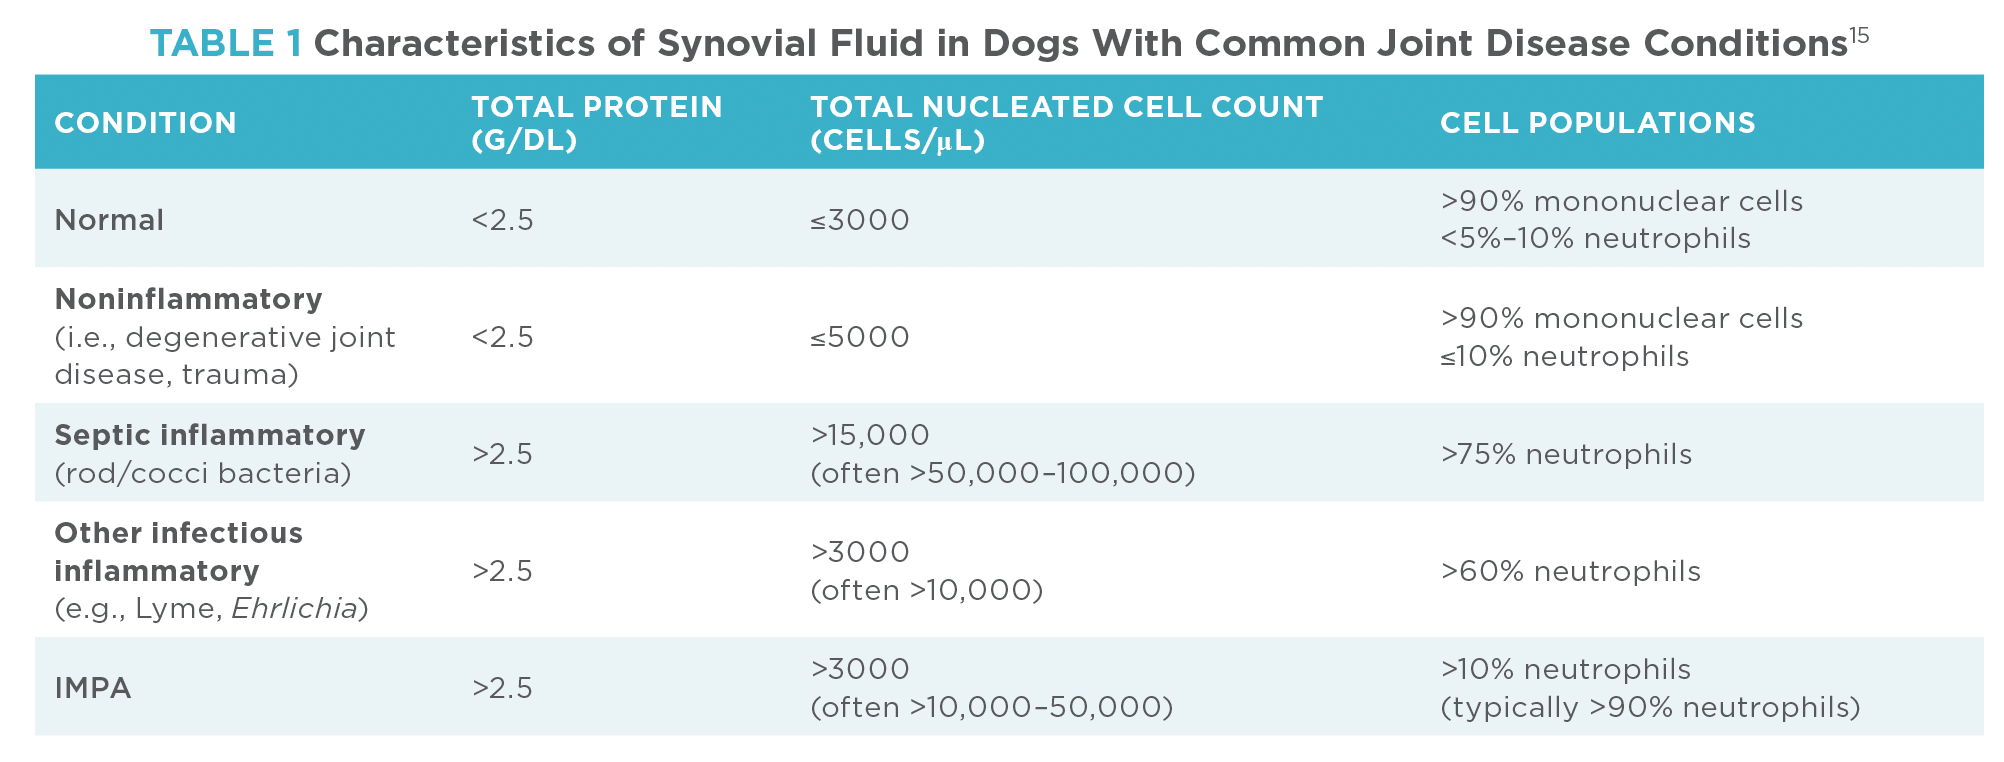 Canine Immune-Mediated Polyarthritis